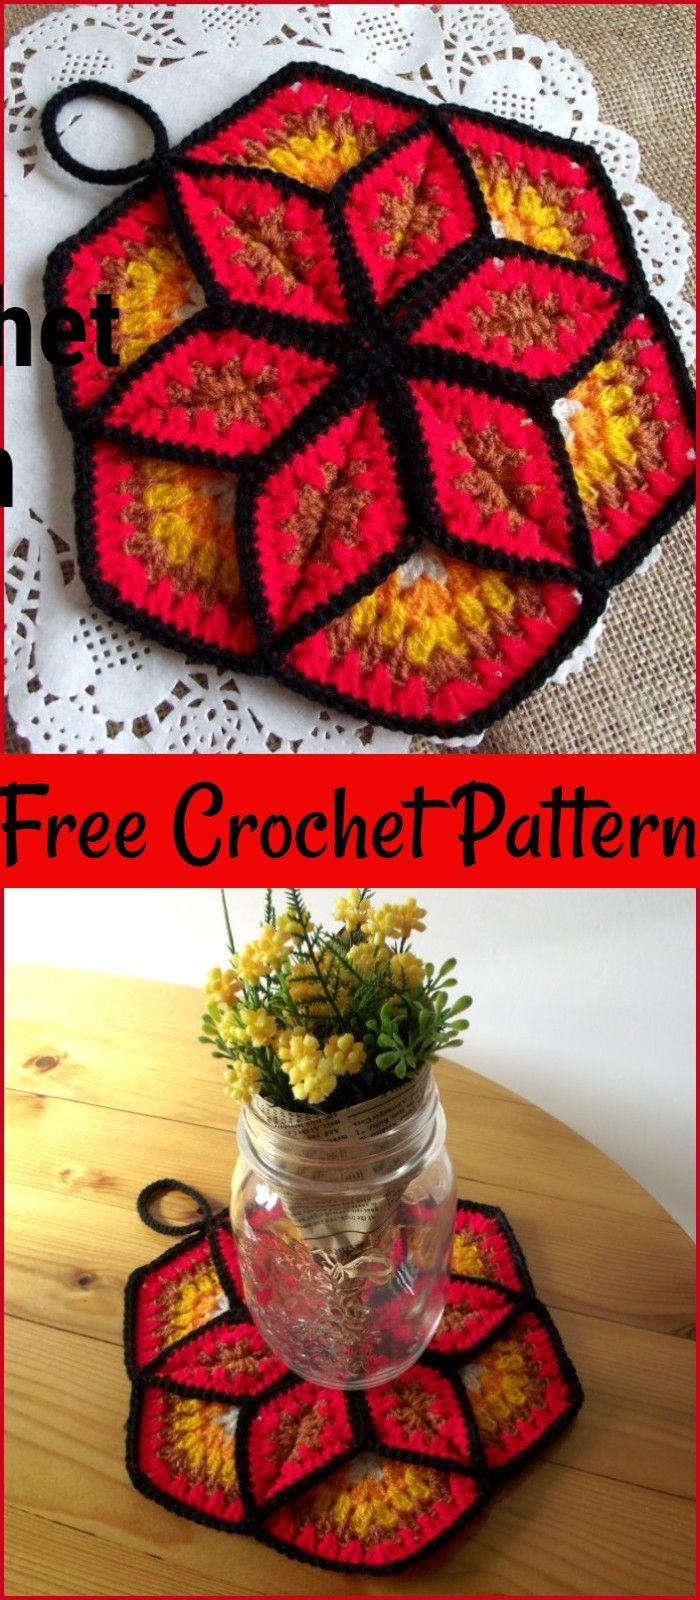 Free Crochet PotHolder Patterns For Your Kitchen – Craft Ideas #crochetpotholderpatterns